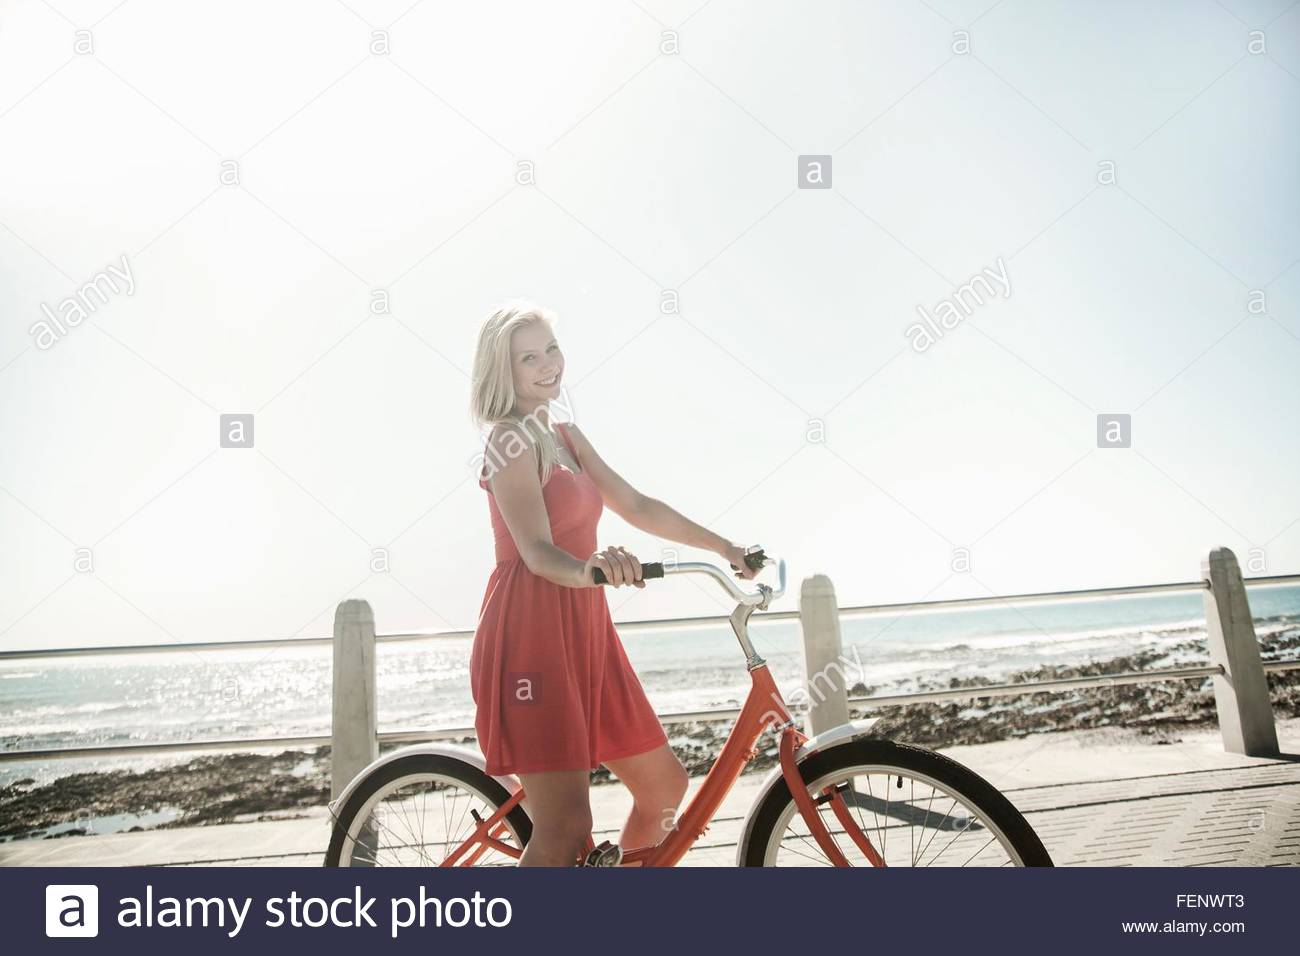 Junge Frau mit dem Fahrrad am Meer, Cape Town, Südafrika Stockbild